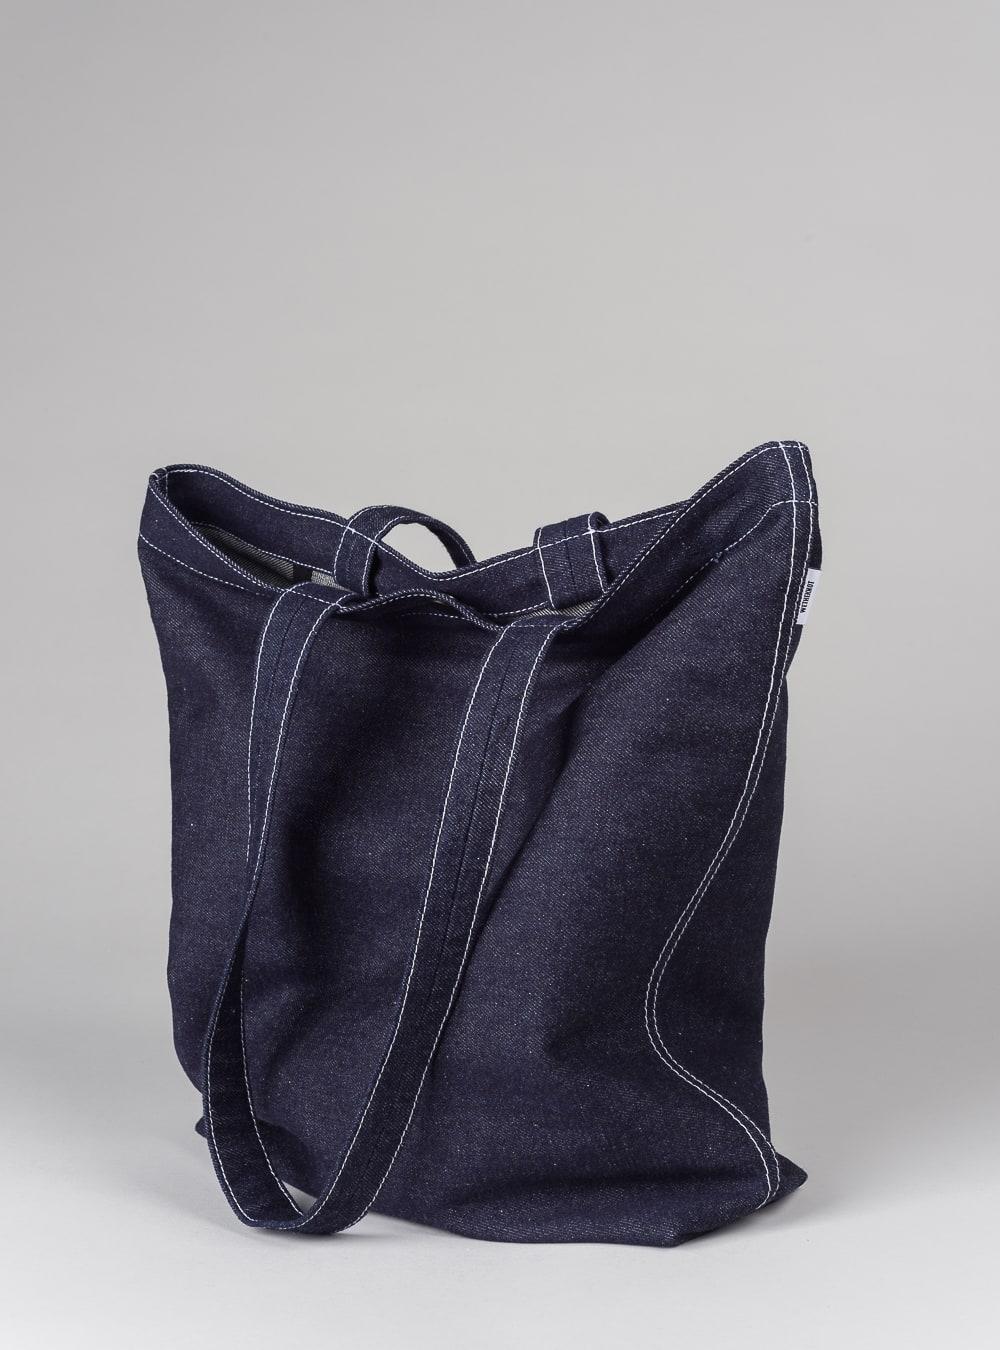 Denim tote bag (dark denim) in cotton, made in Portugal by wetheknot.